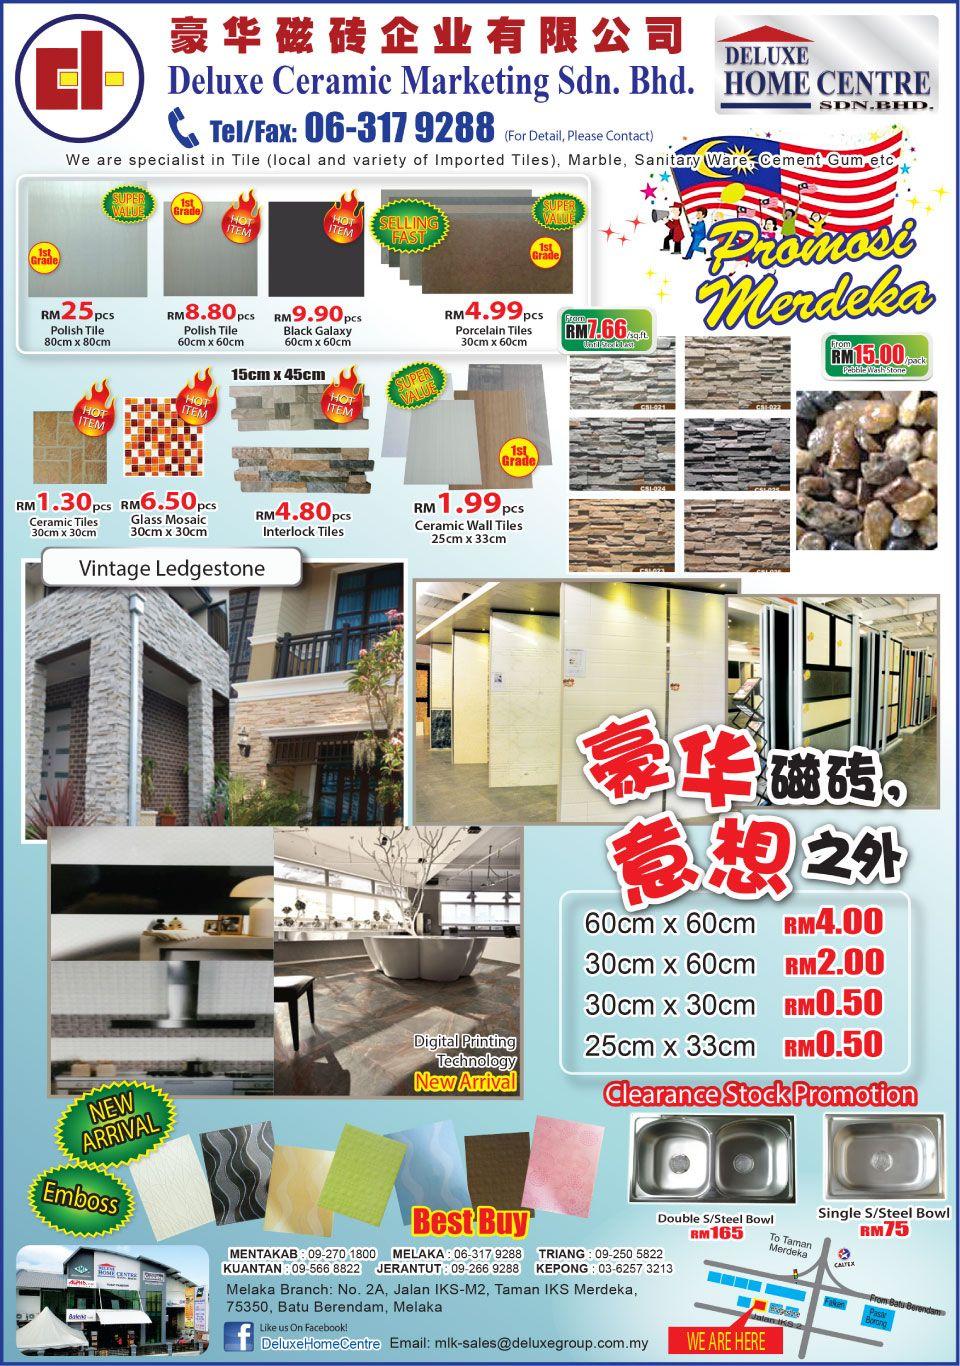 deluxe ceramic marketing sdn bhd | ceramic tiles in malaysia ...